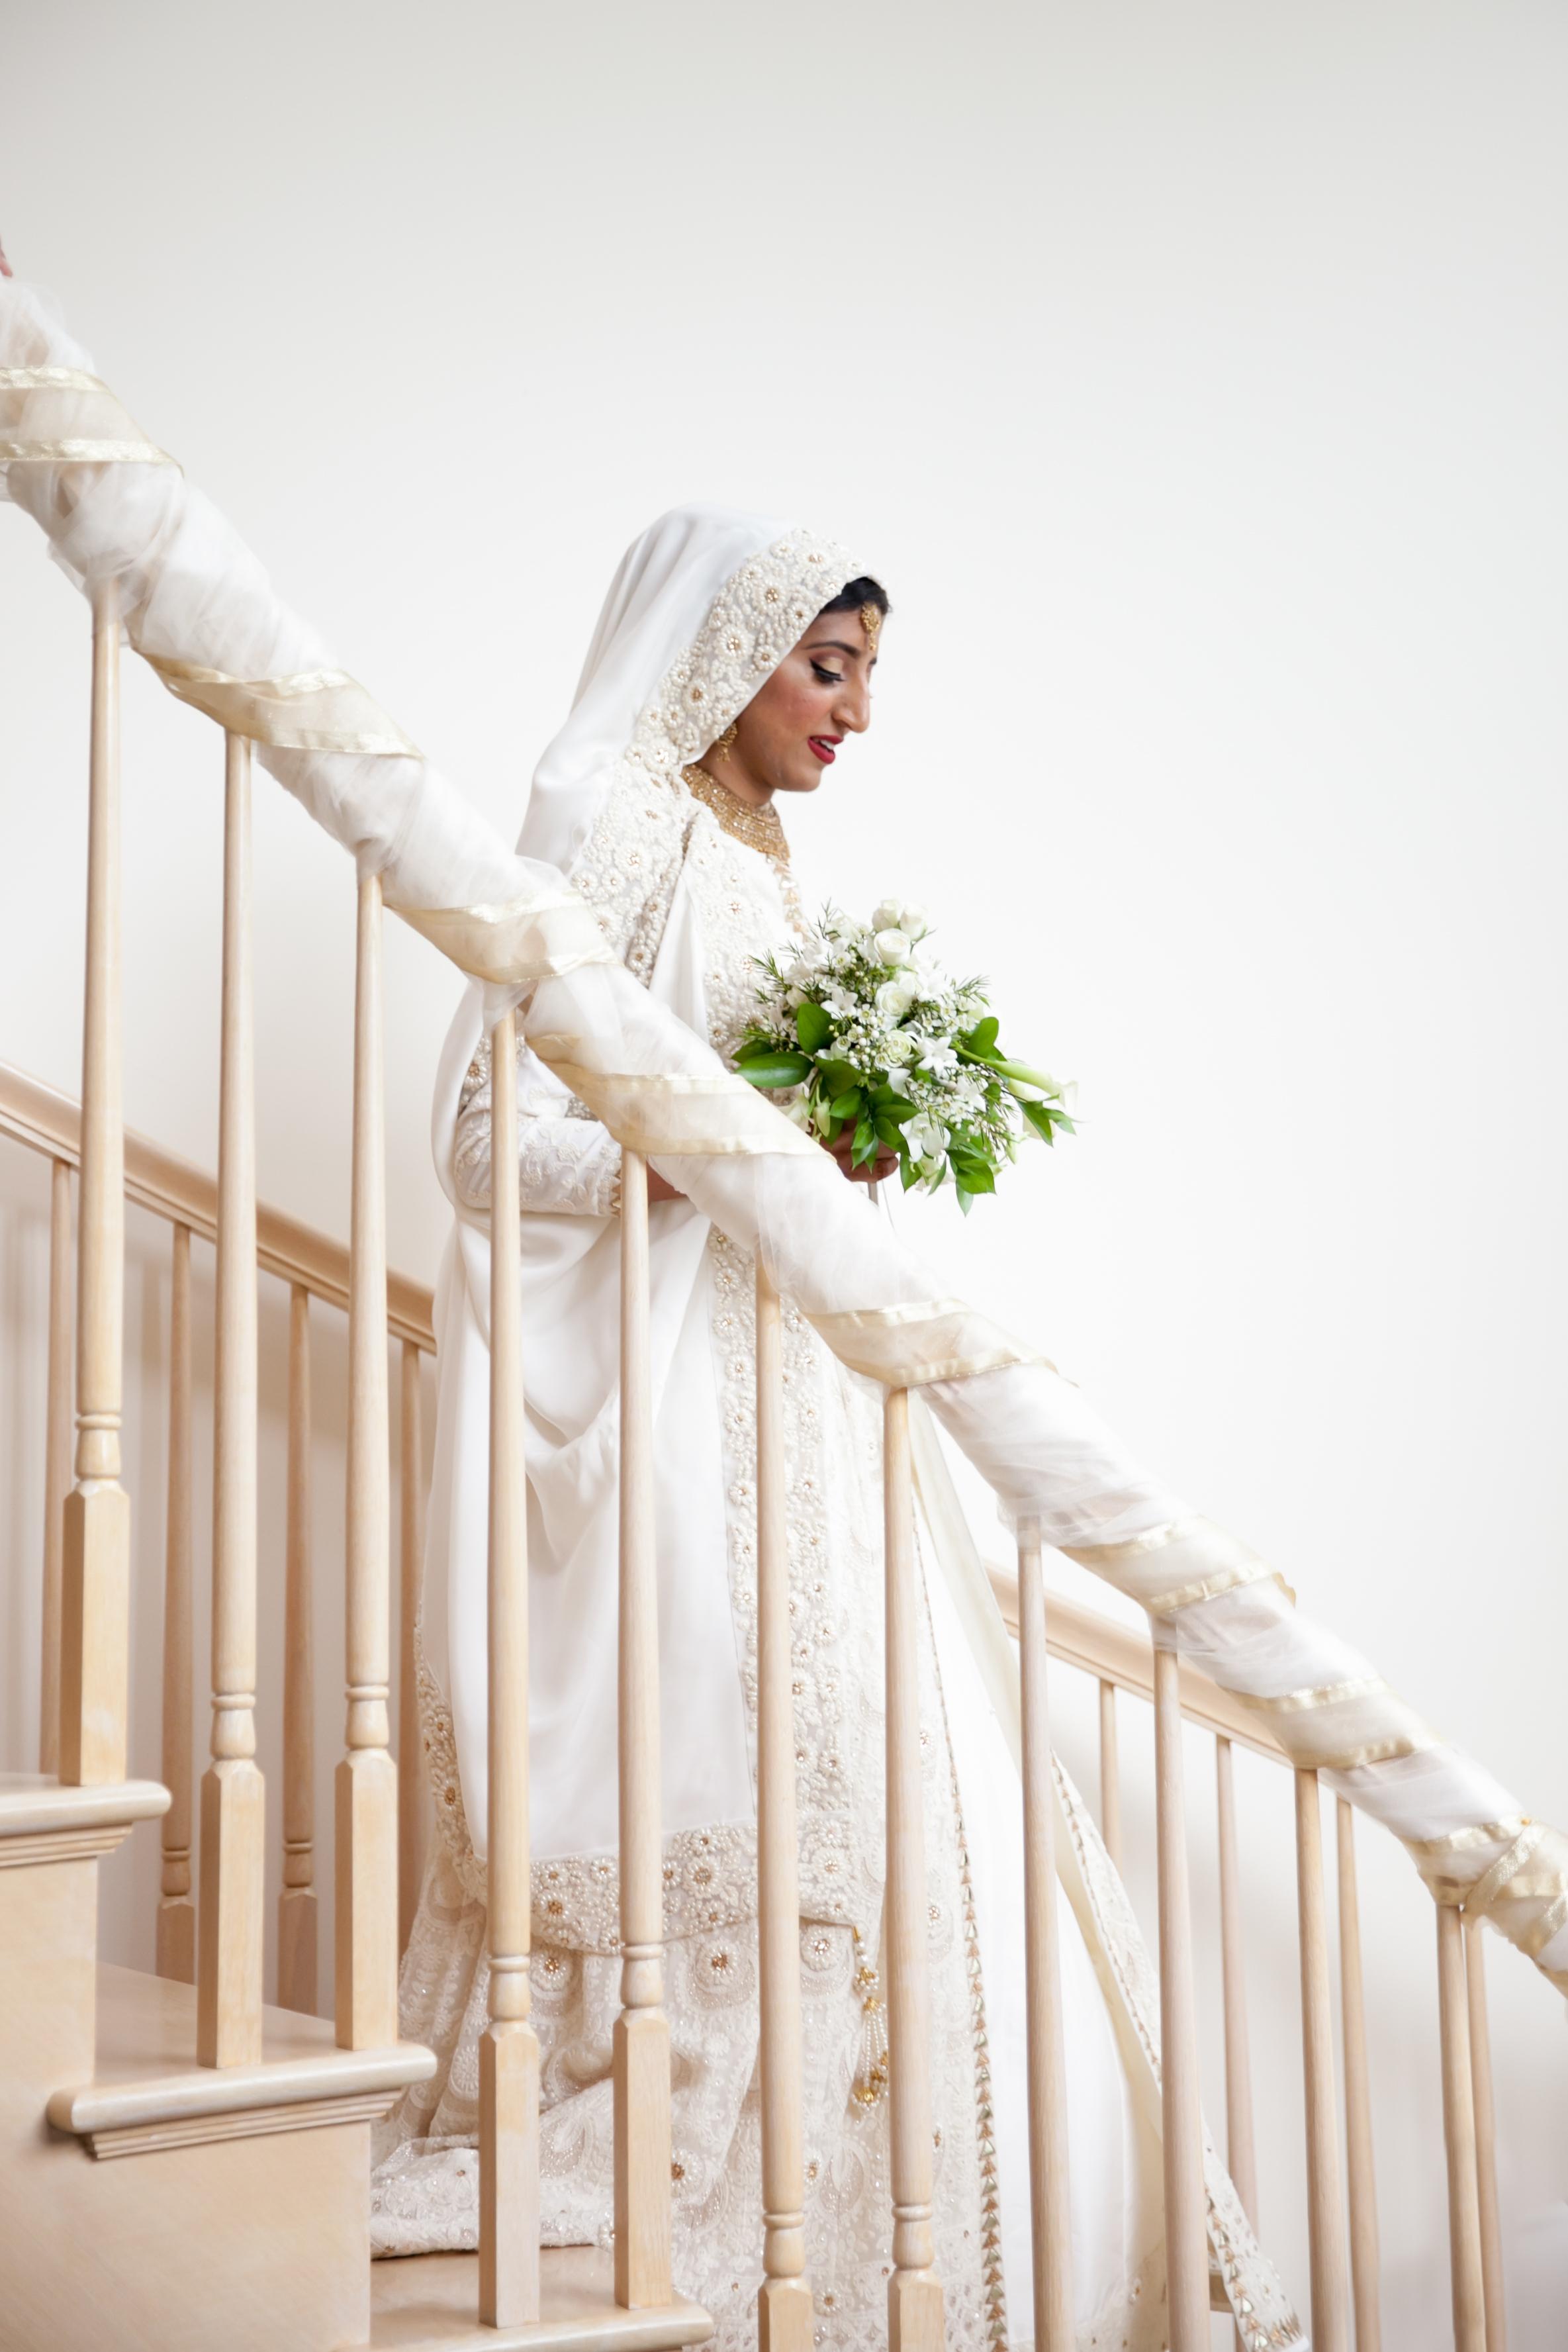 LisaDiederichPhotography_Maryam&Salman_Highlights-35.jpg